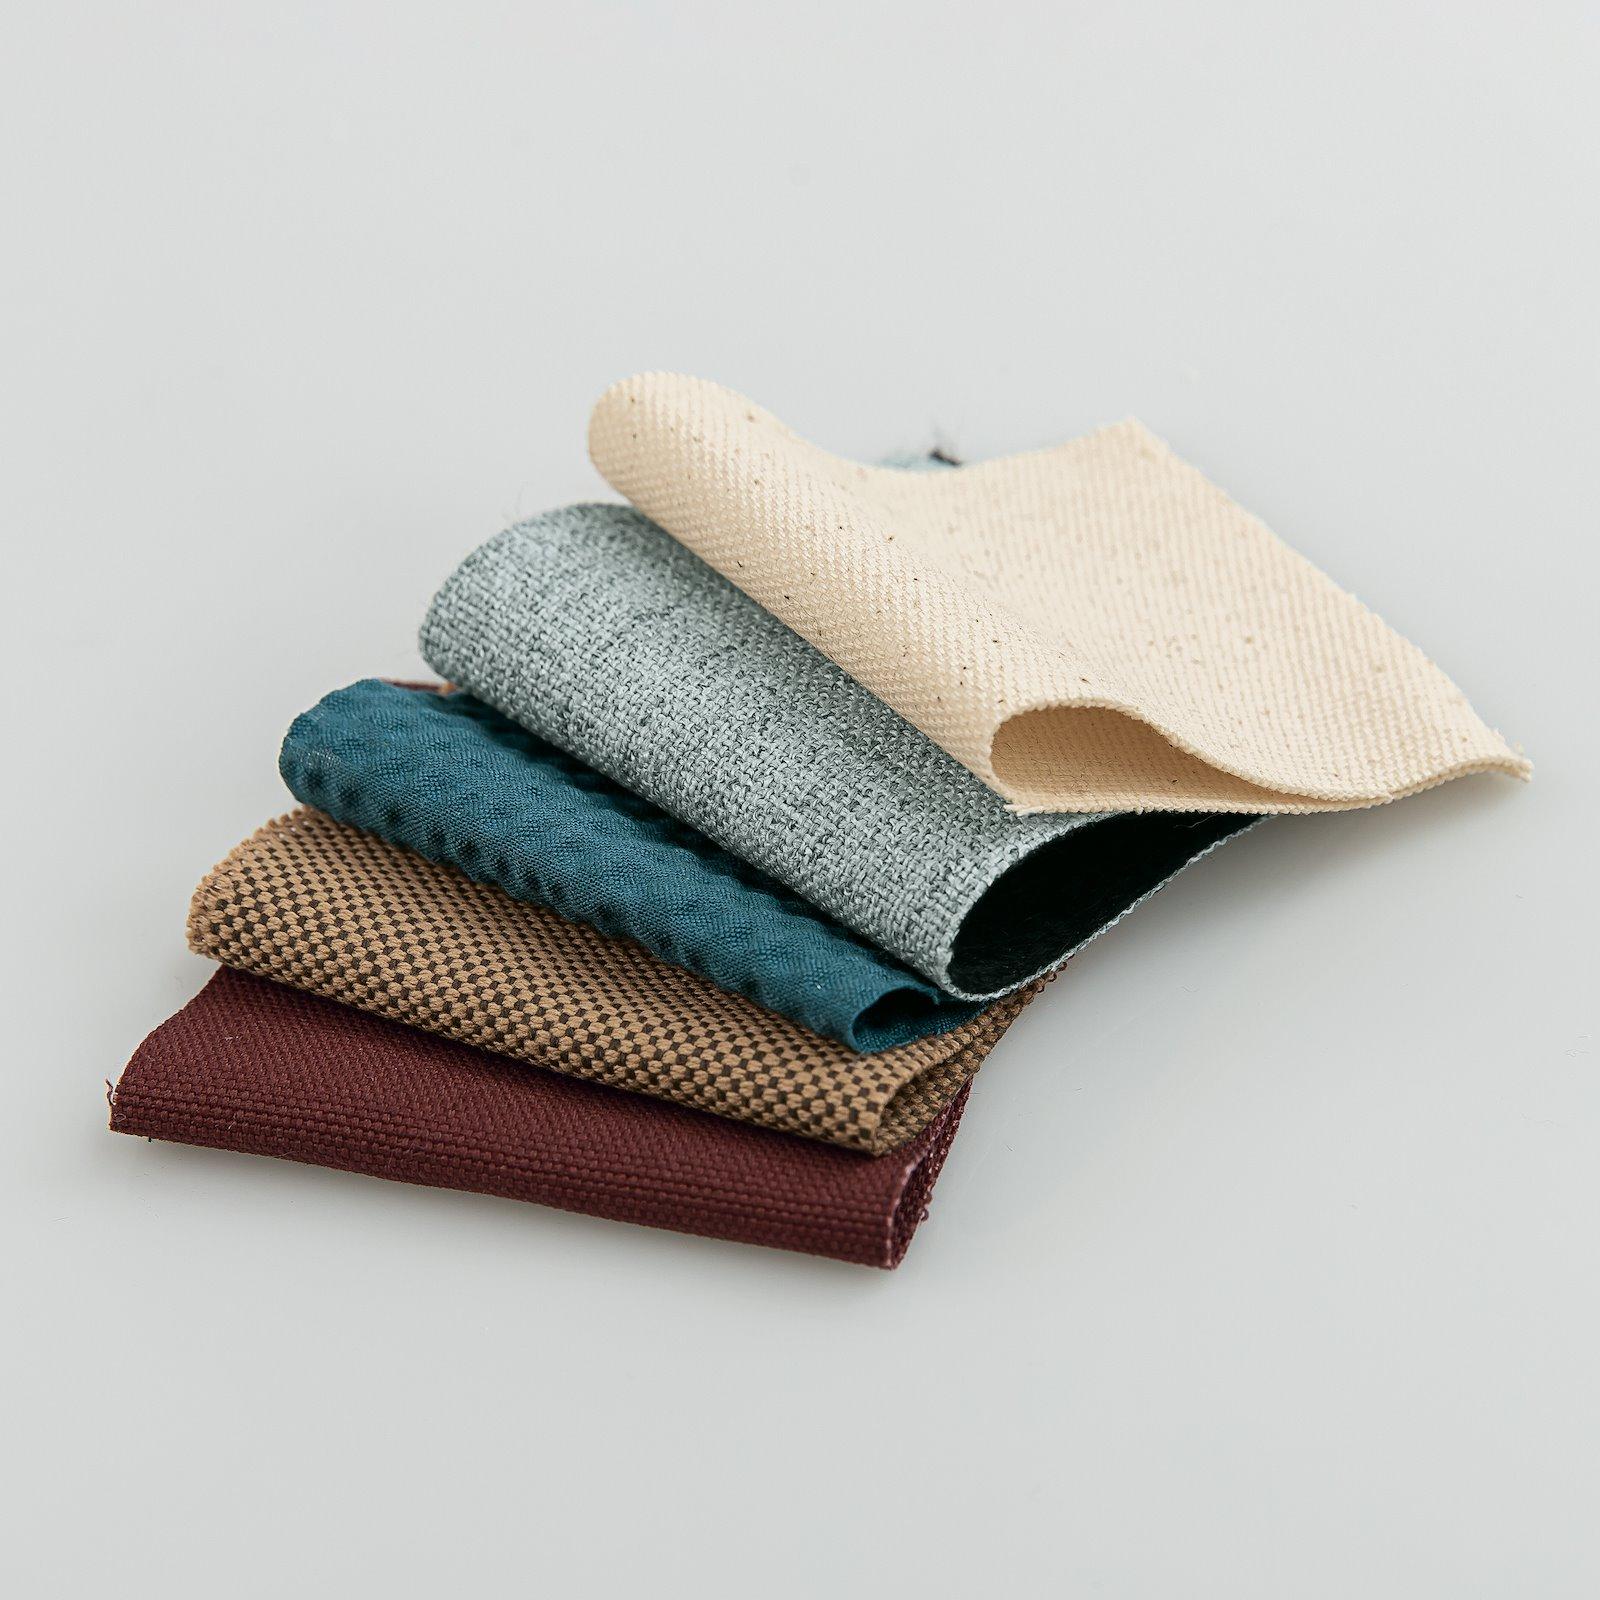 Upholstery fabric w/backing dusty aqua 780190_824050_580069_780545_780538_bundle